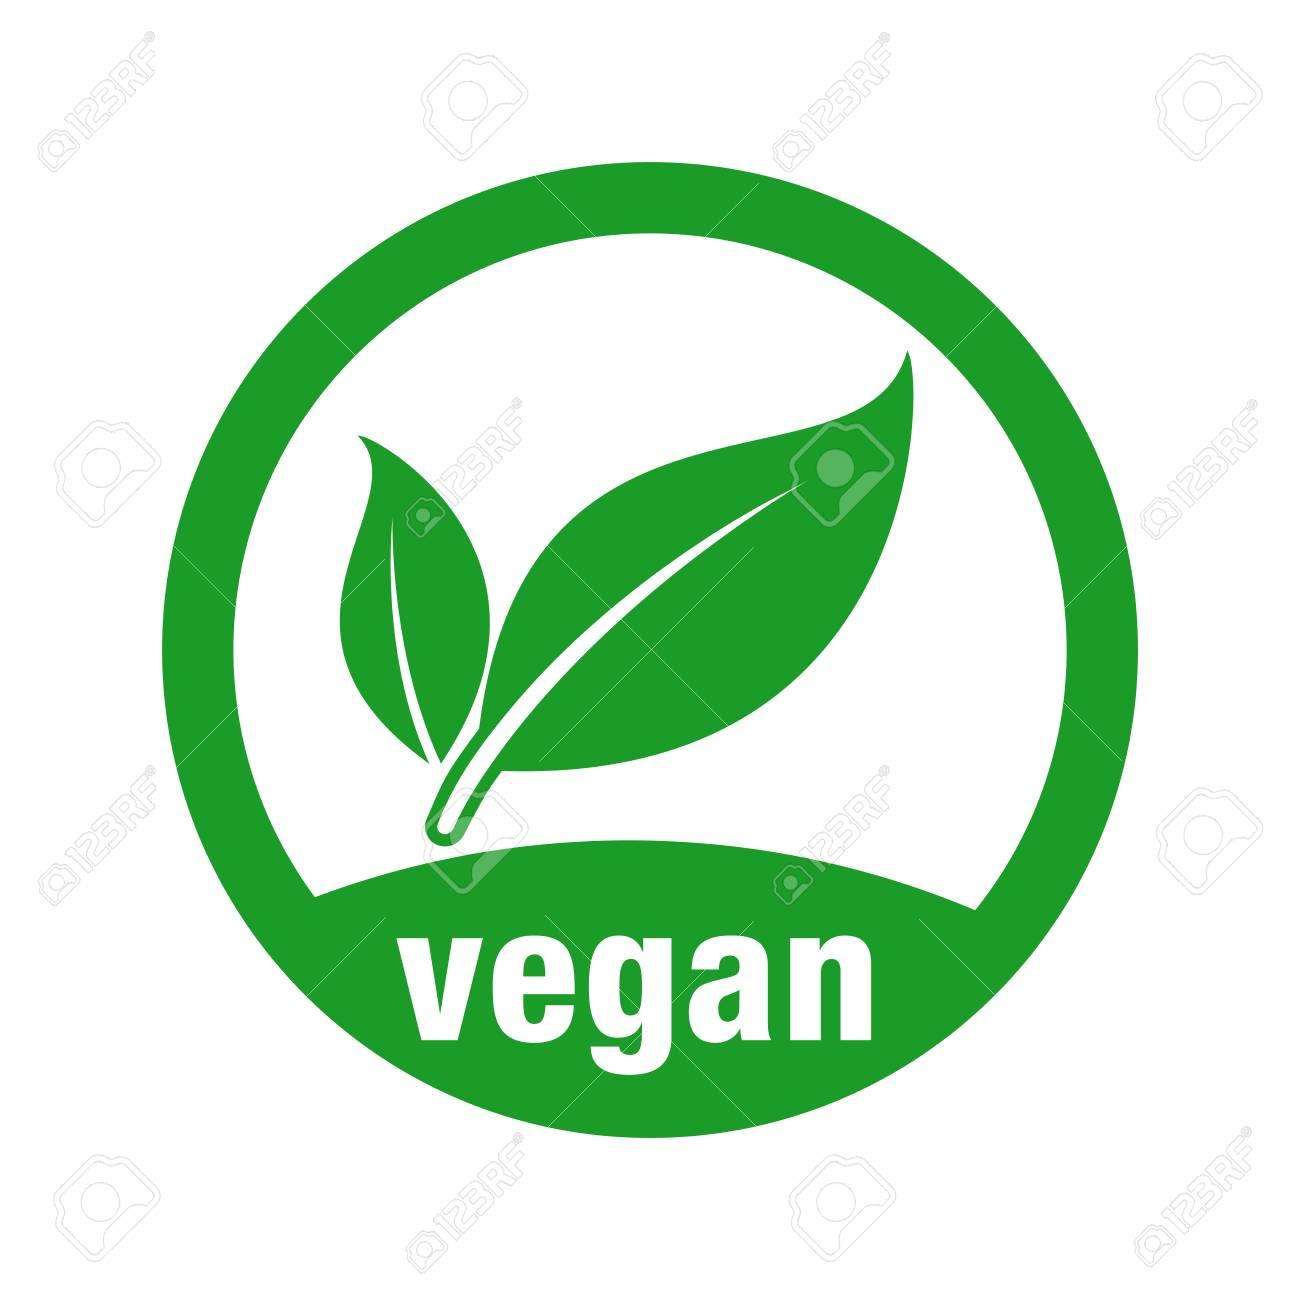 icon for vegan food - 93235931